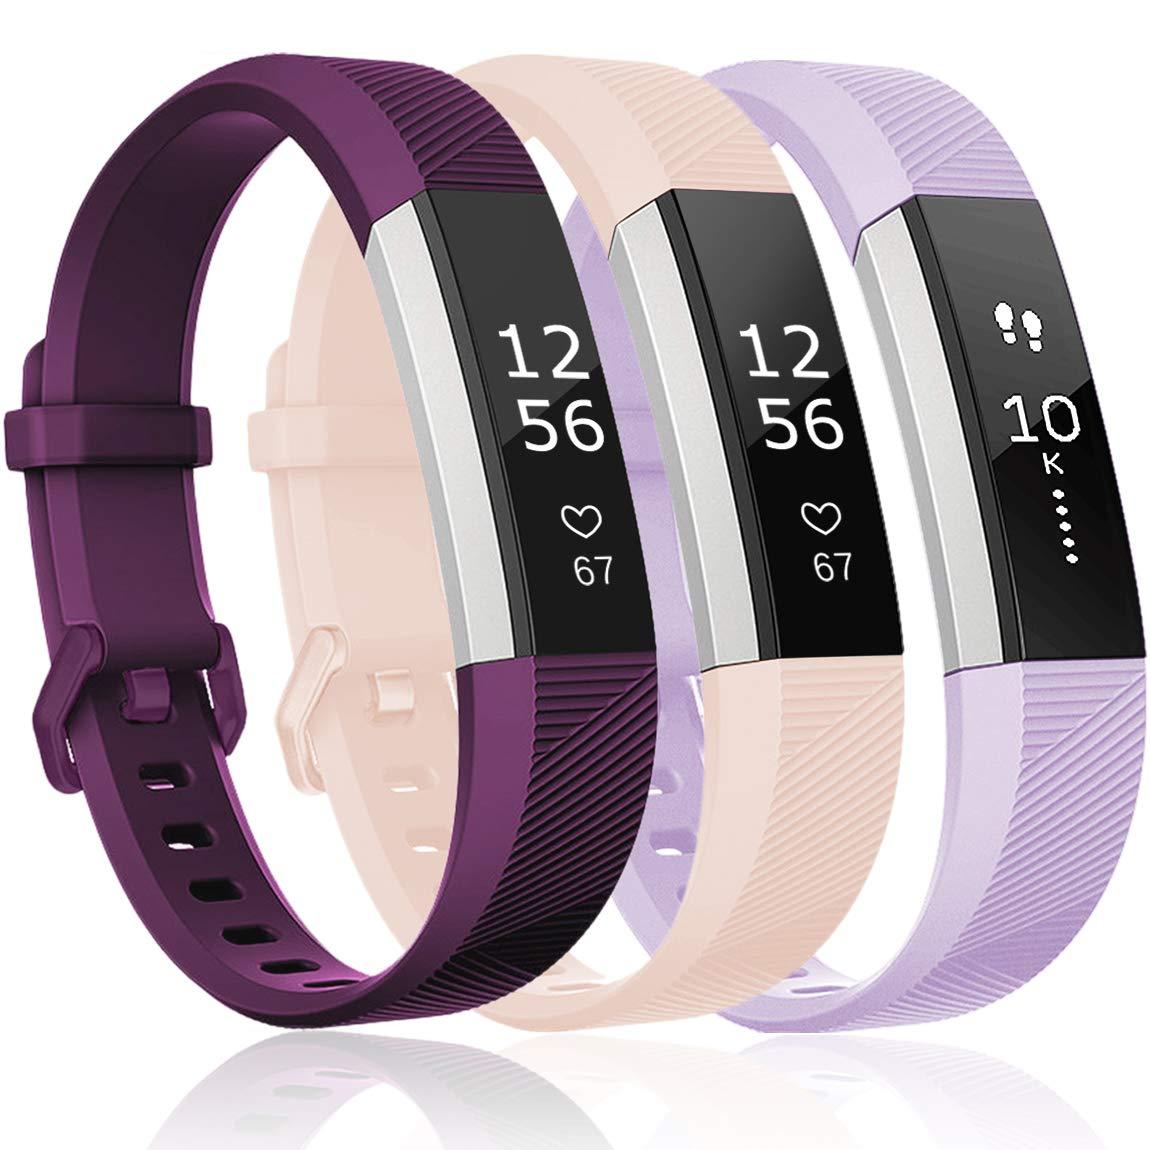 Mallas Para Reloj Fitbit Alta, Alta Hr Y Fitbit Ace ( (7526)